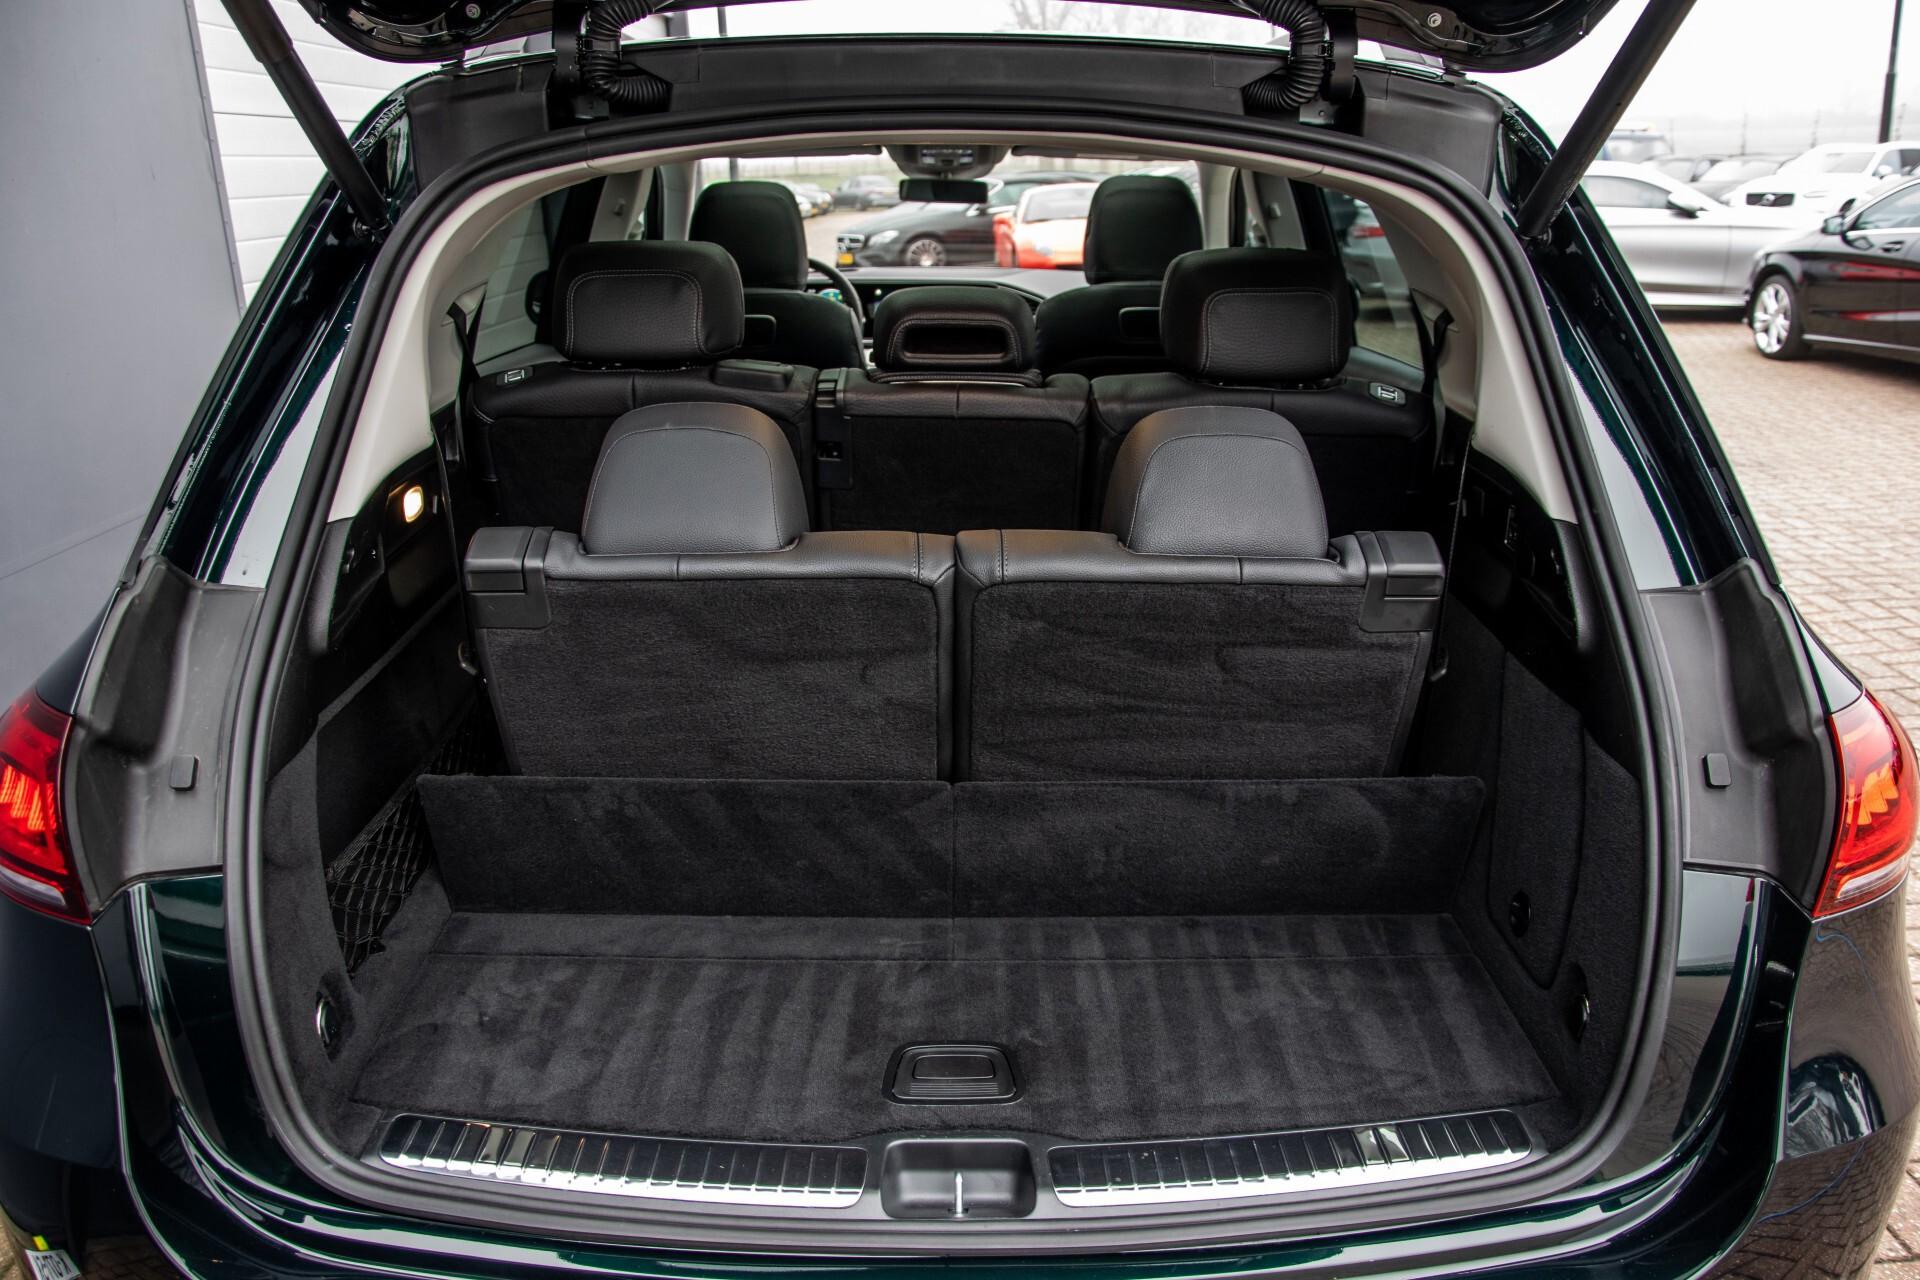 Mercedes-Benz GLE 450 4-M 7-Persoons AMG Massage/Rij-assist/Keyless/TV/360/Night/Trekhaak Aut9 Foto 68